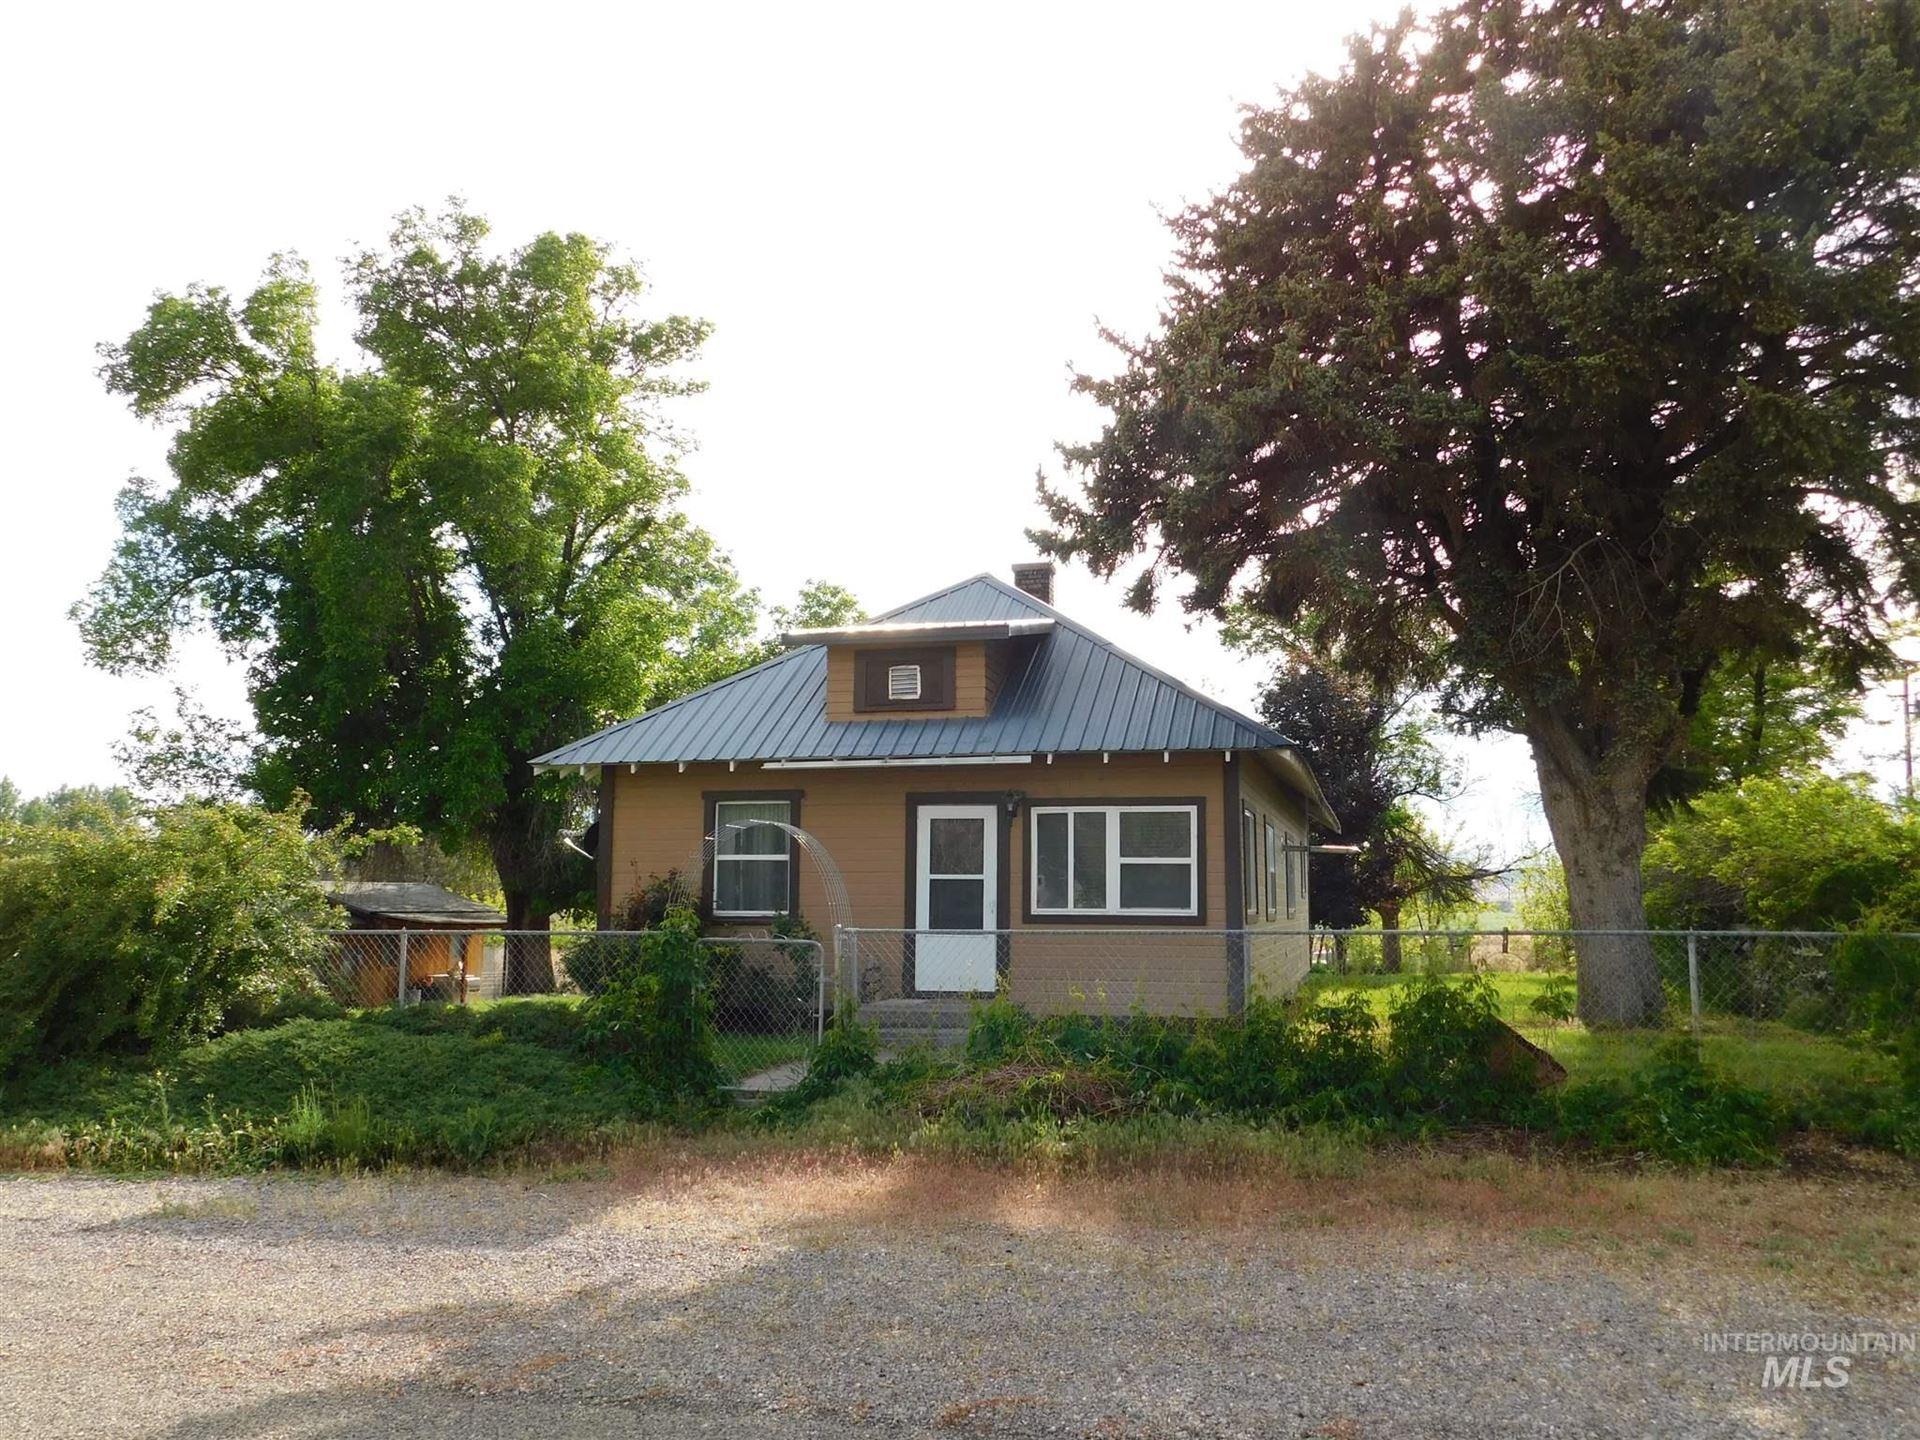 Photo of 551 S School House Rd, Hammett, ID 83627 (MLS # 98767468)